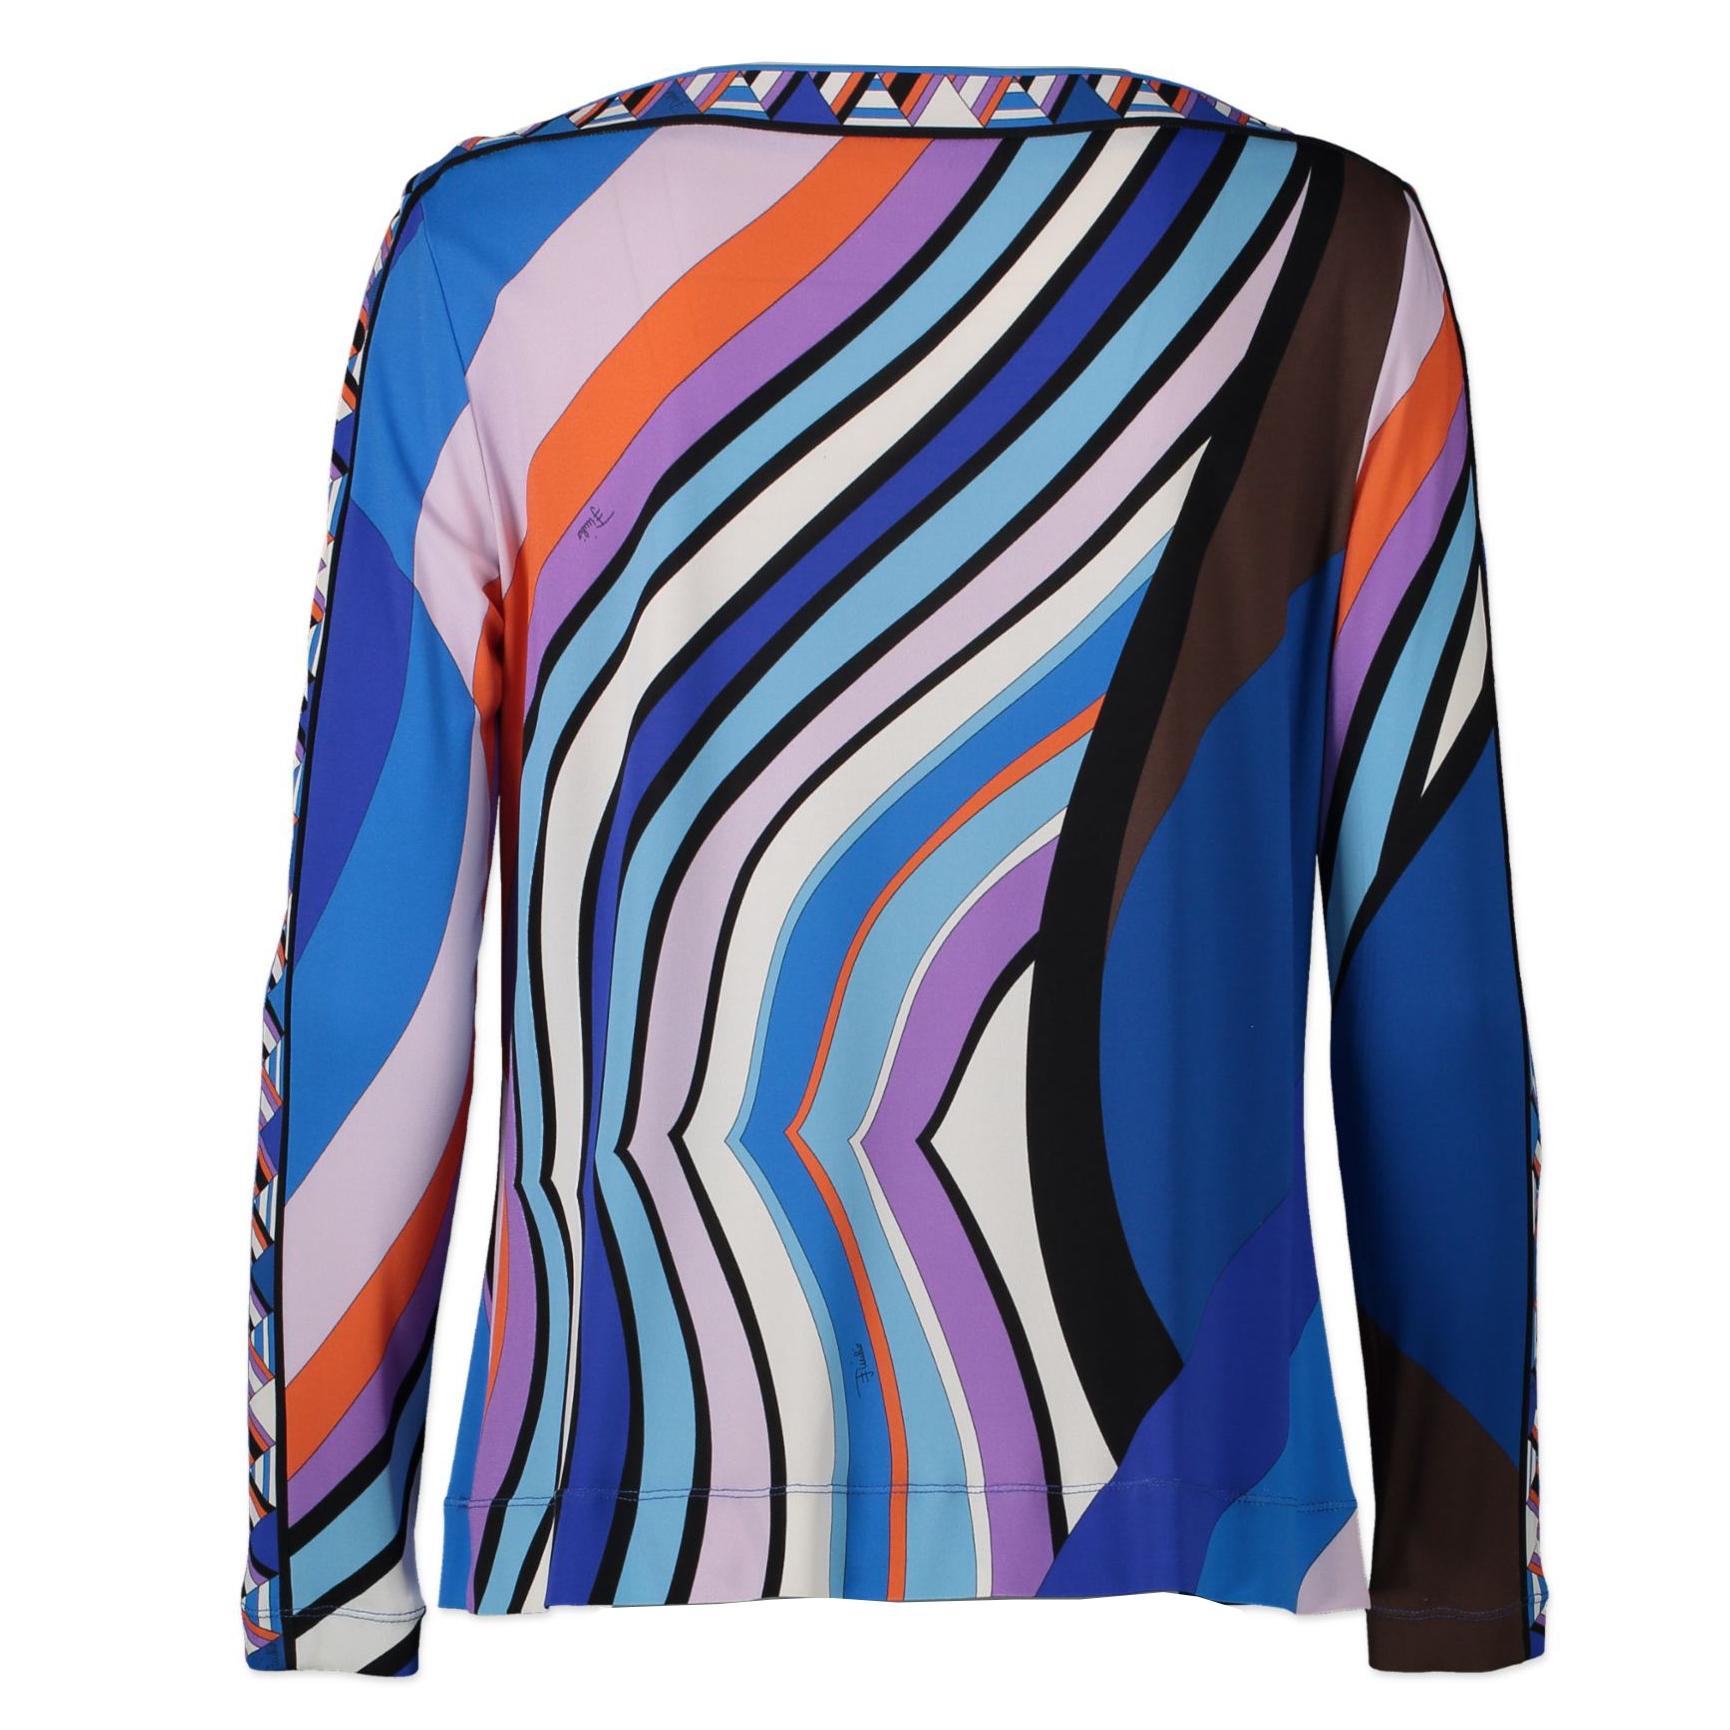 Emilio Pucci Multicolor Fuilio Top - Size S - kopen en verkopen online